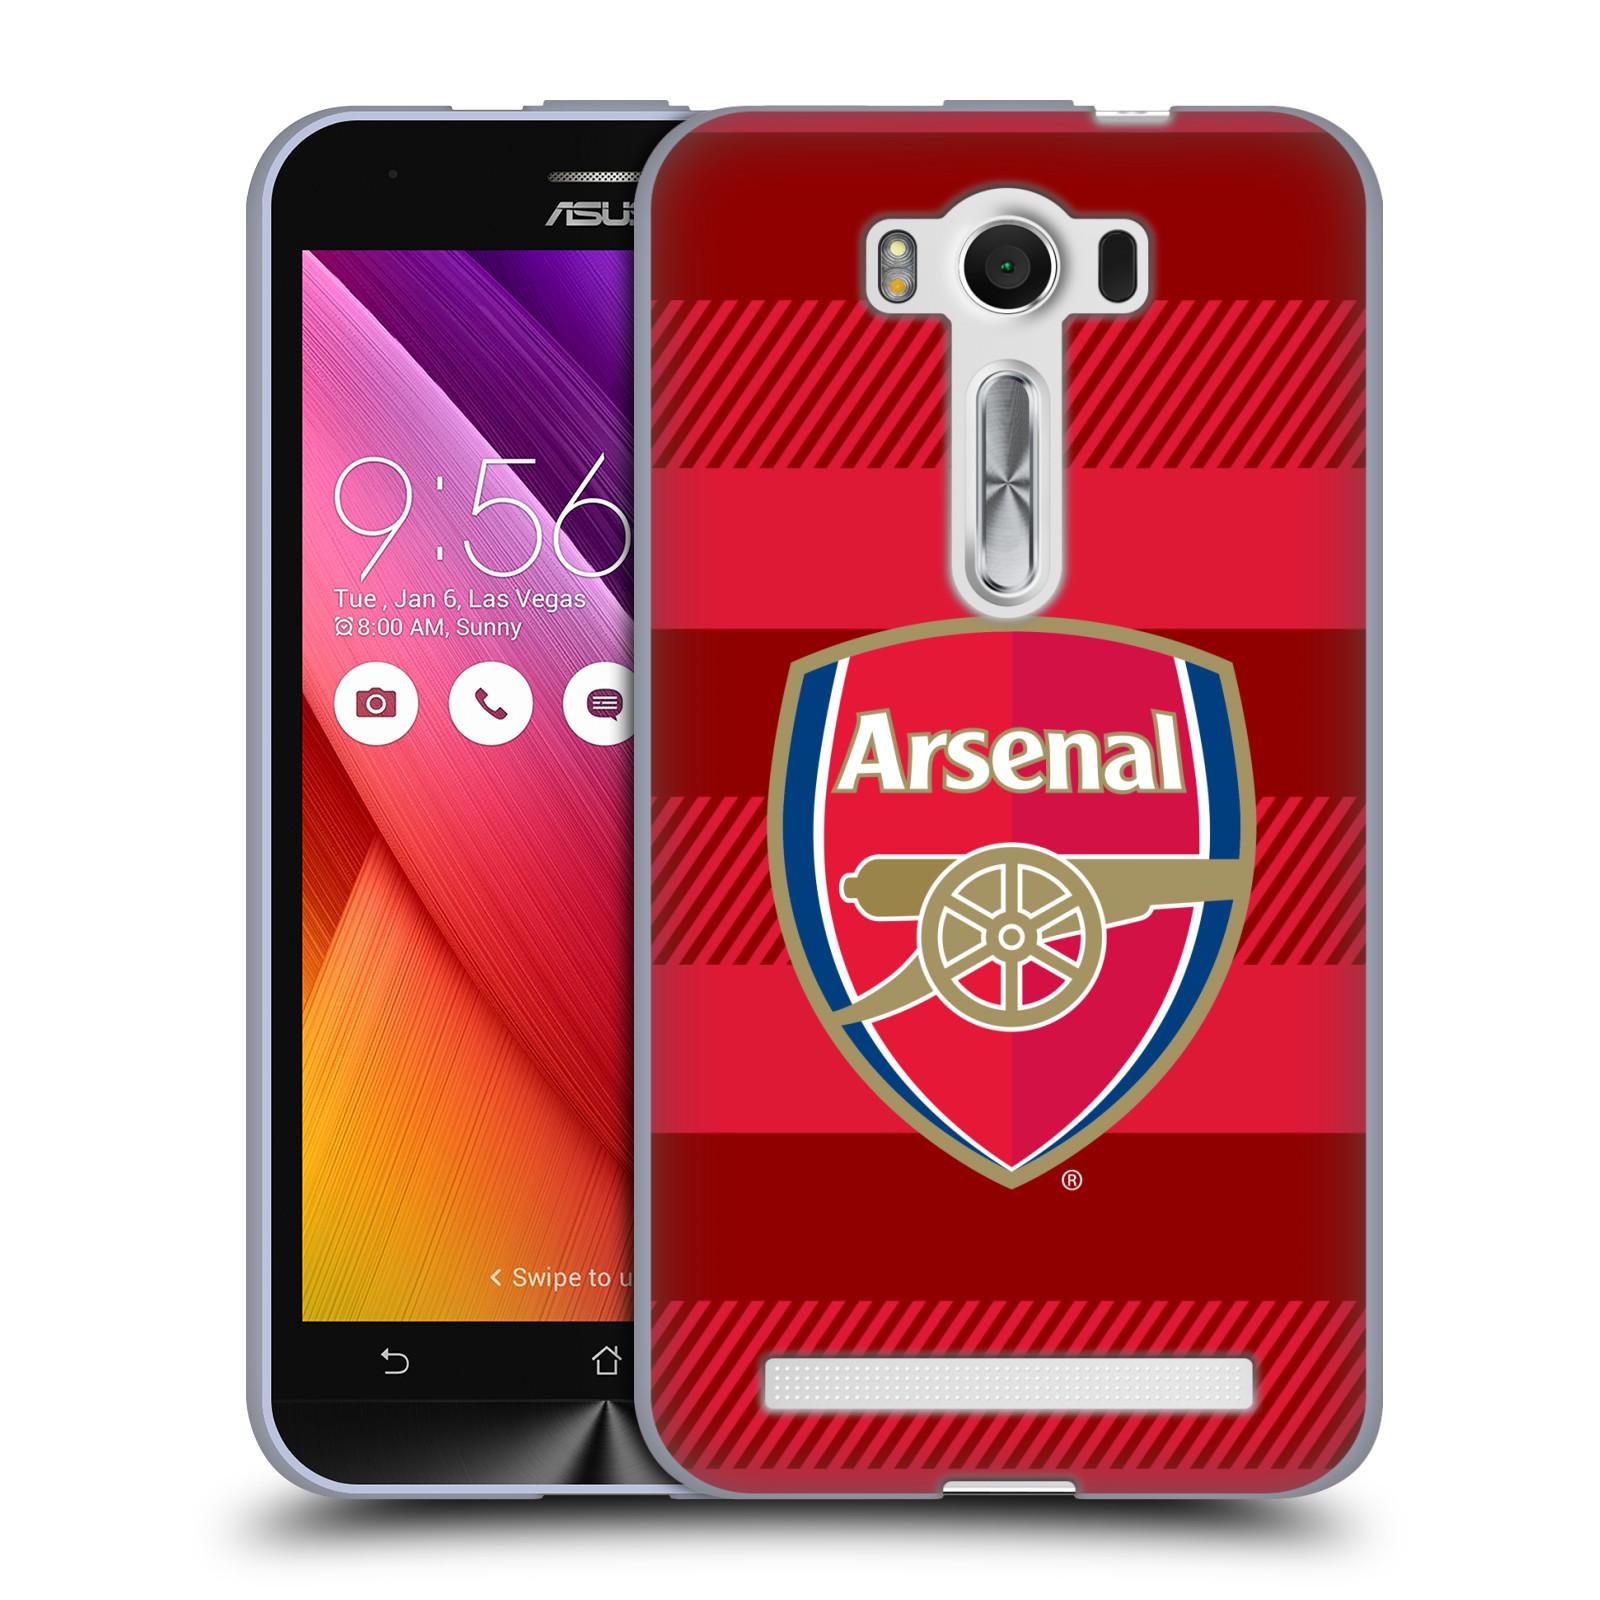 Silikonové pouzdro na mobil Asus ZenFone 2 Laser ZE500KL - Head Case - Arsenal FC - Logo s pruhy